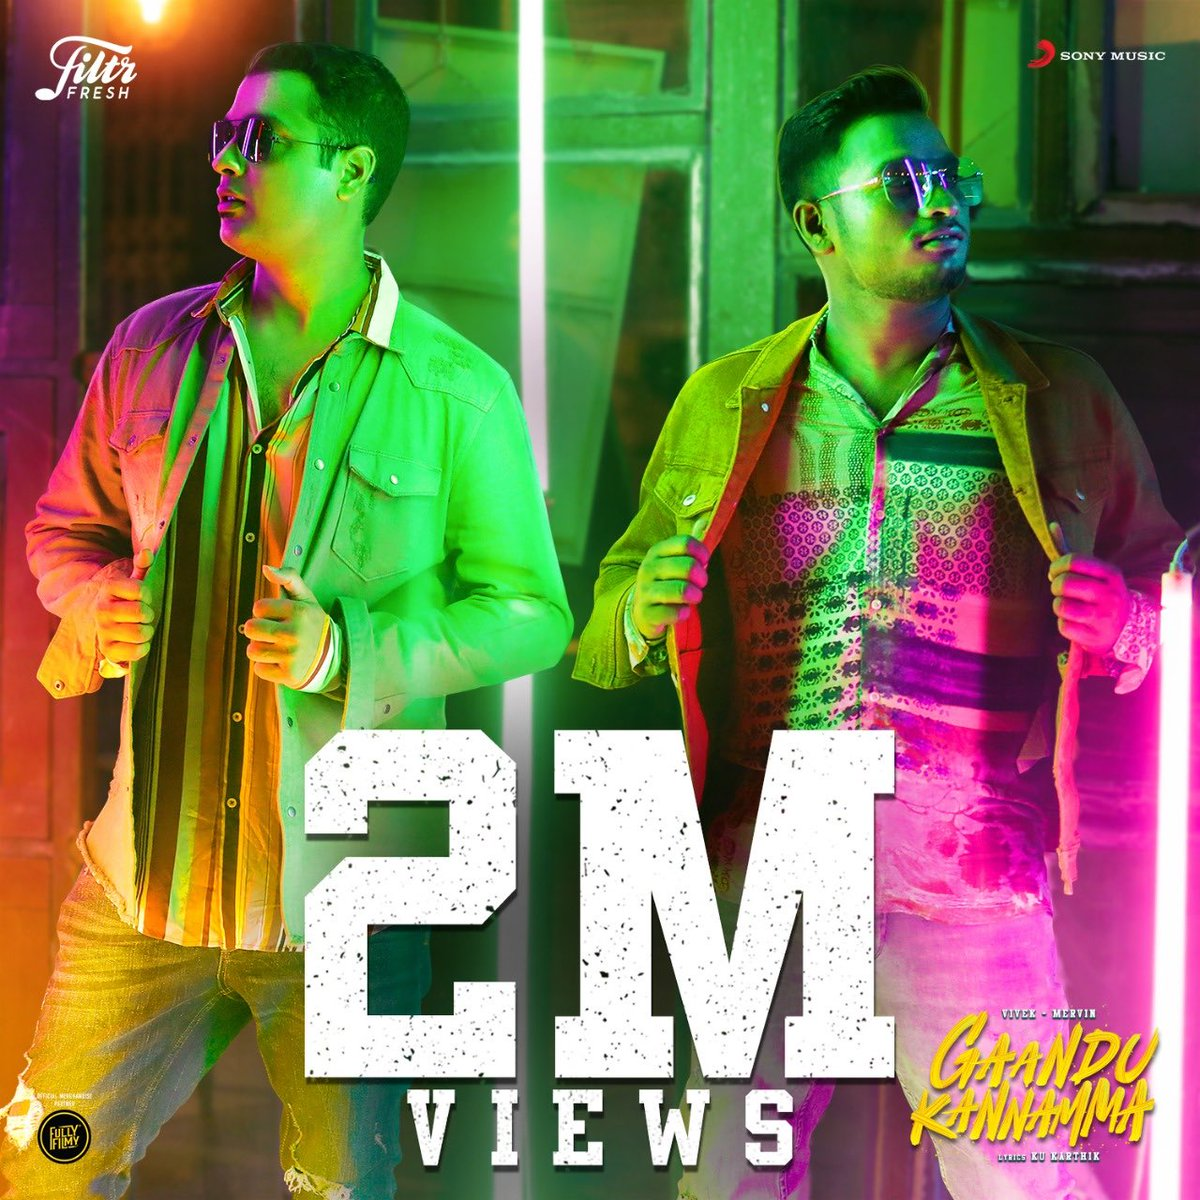 Thank you 😊  #GaanduKannamma hits 2 million views !!   @MervinJSolomon @SonyMusicSouth @KuKarthk @amithkrishnan85 @PawanAlex @JafferJiky